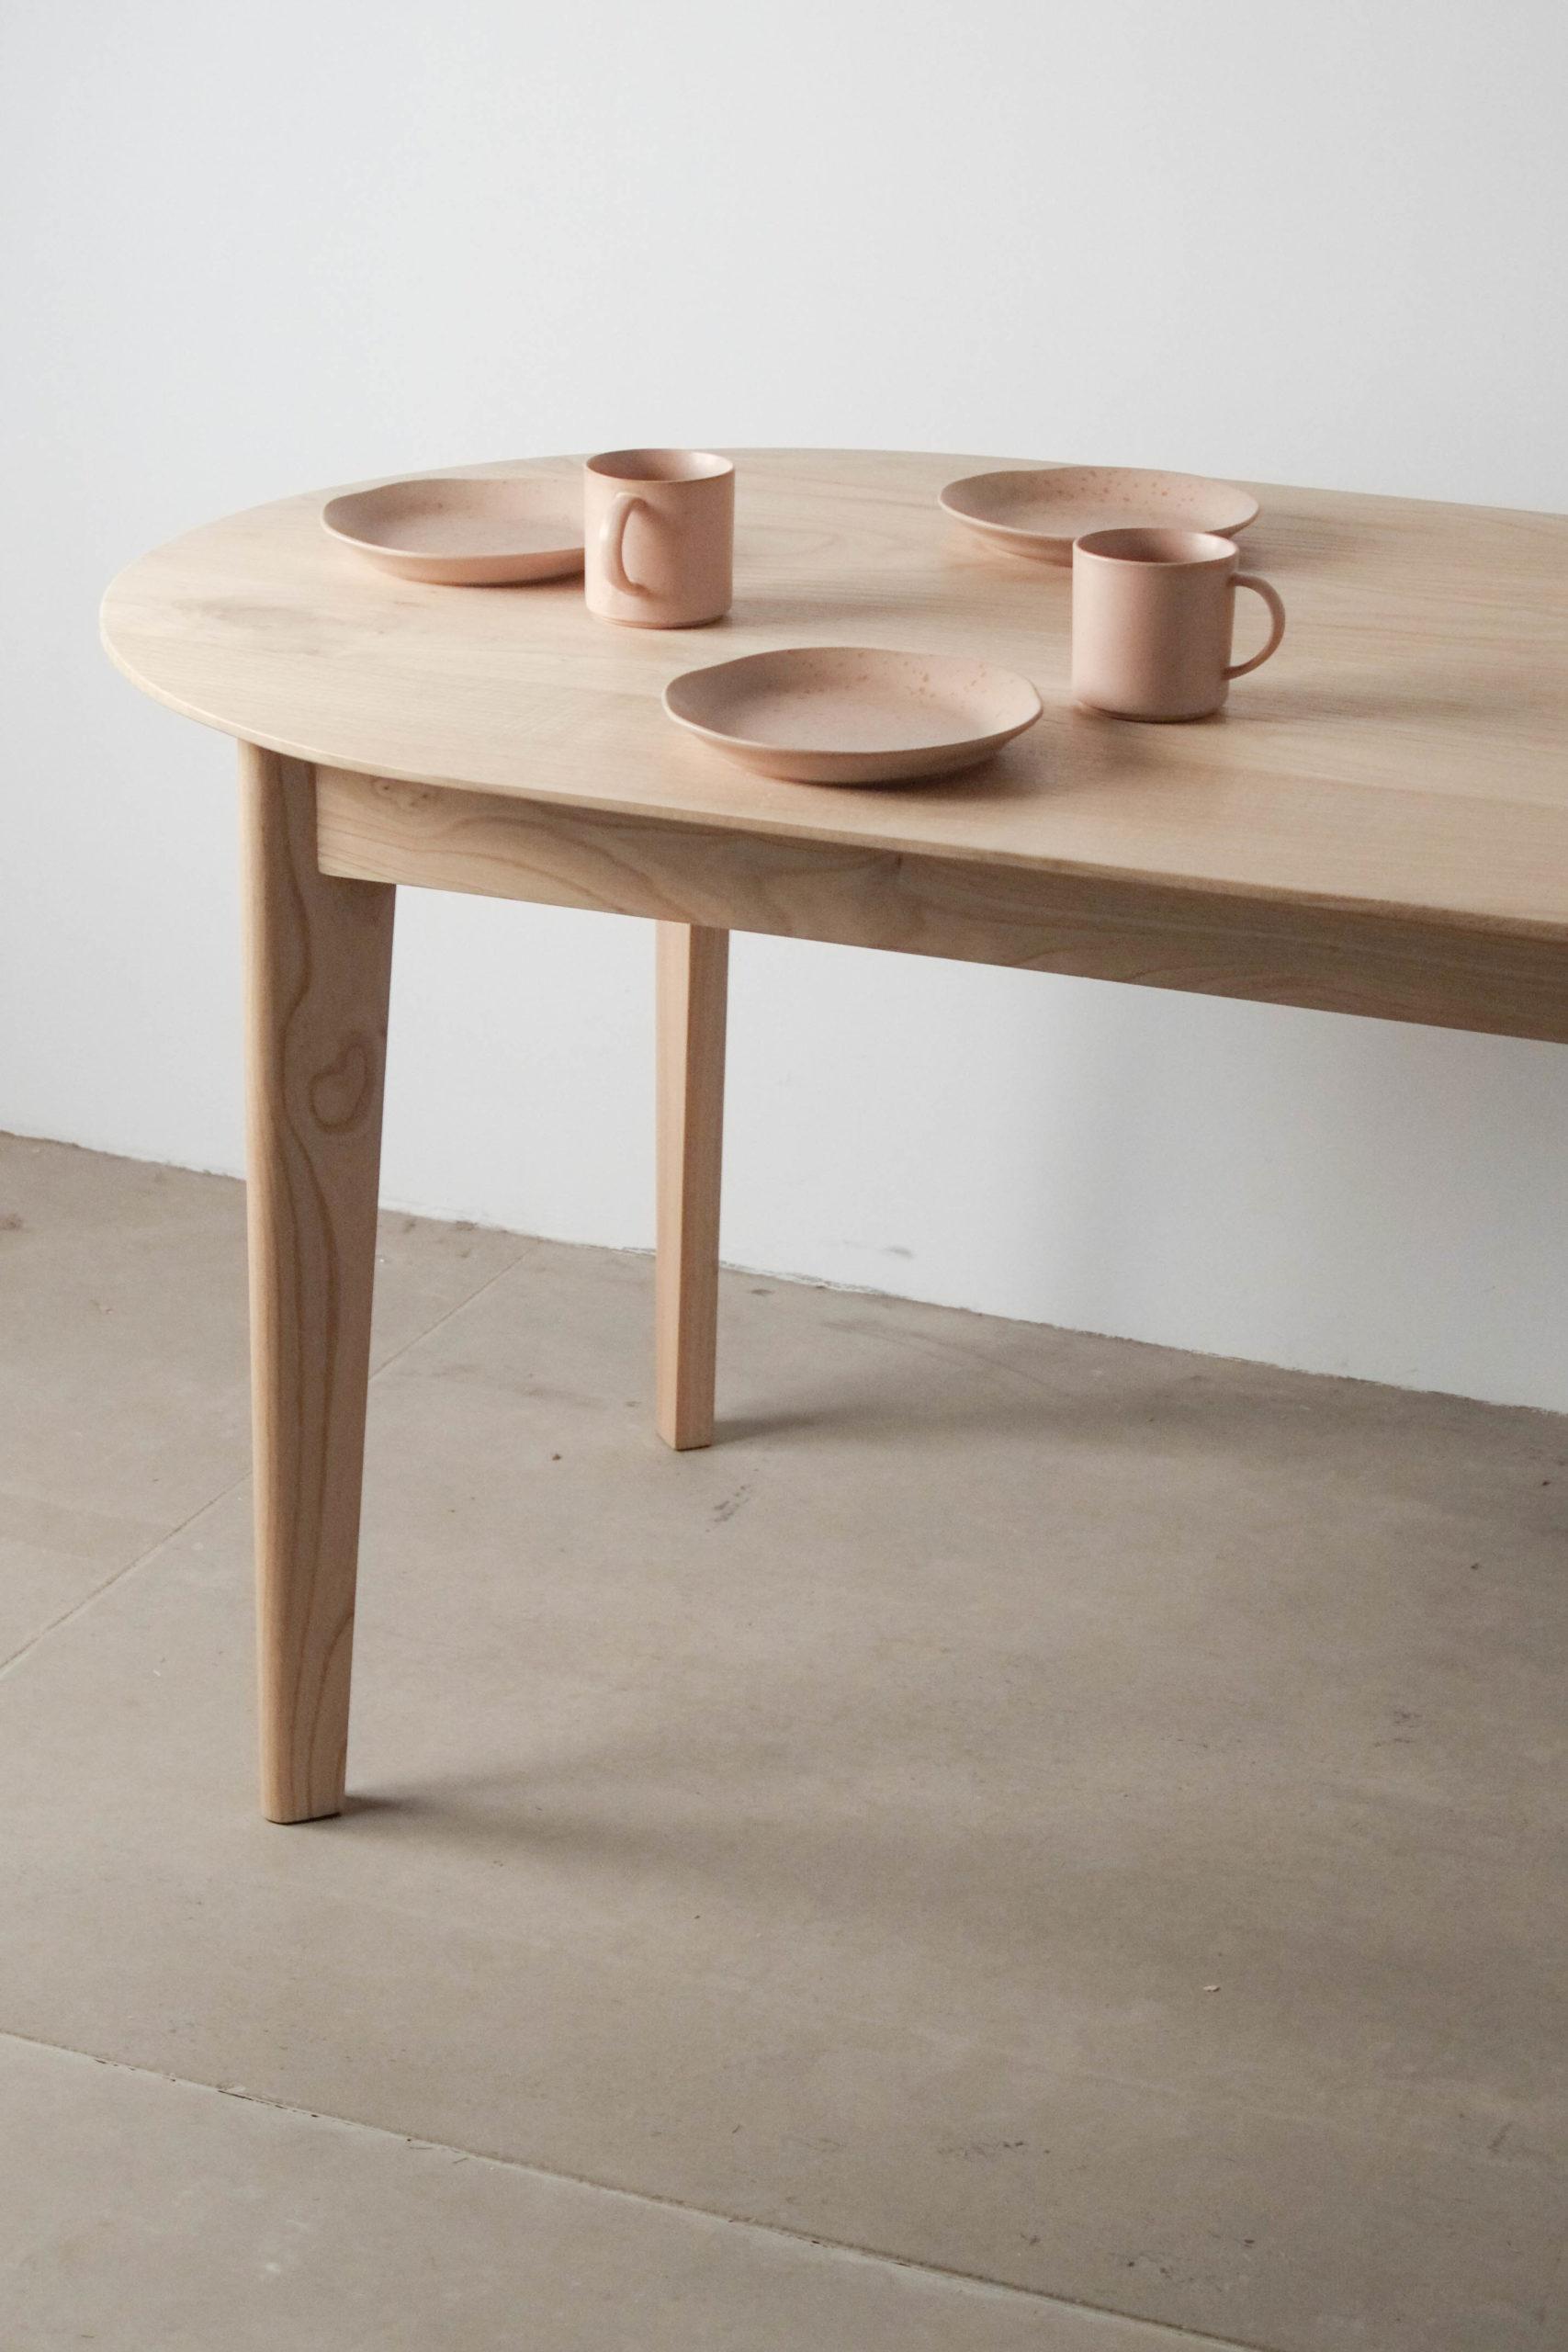 mesa de comedor detalle con platos tazas vasos de diseño madera maciza